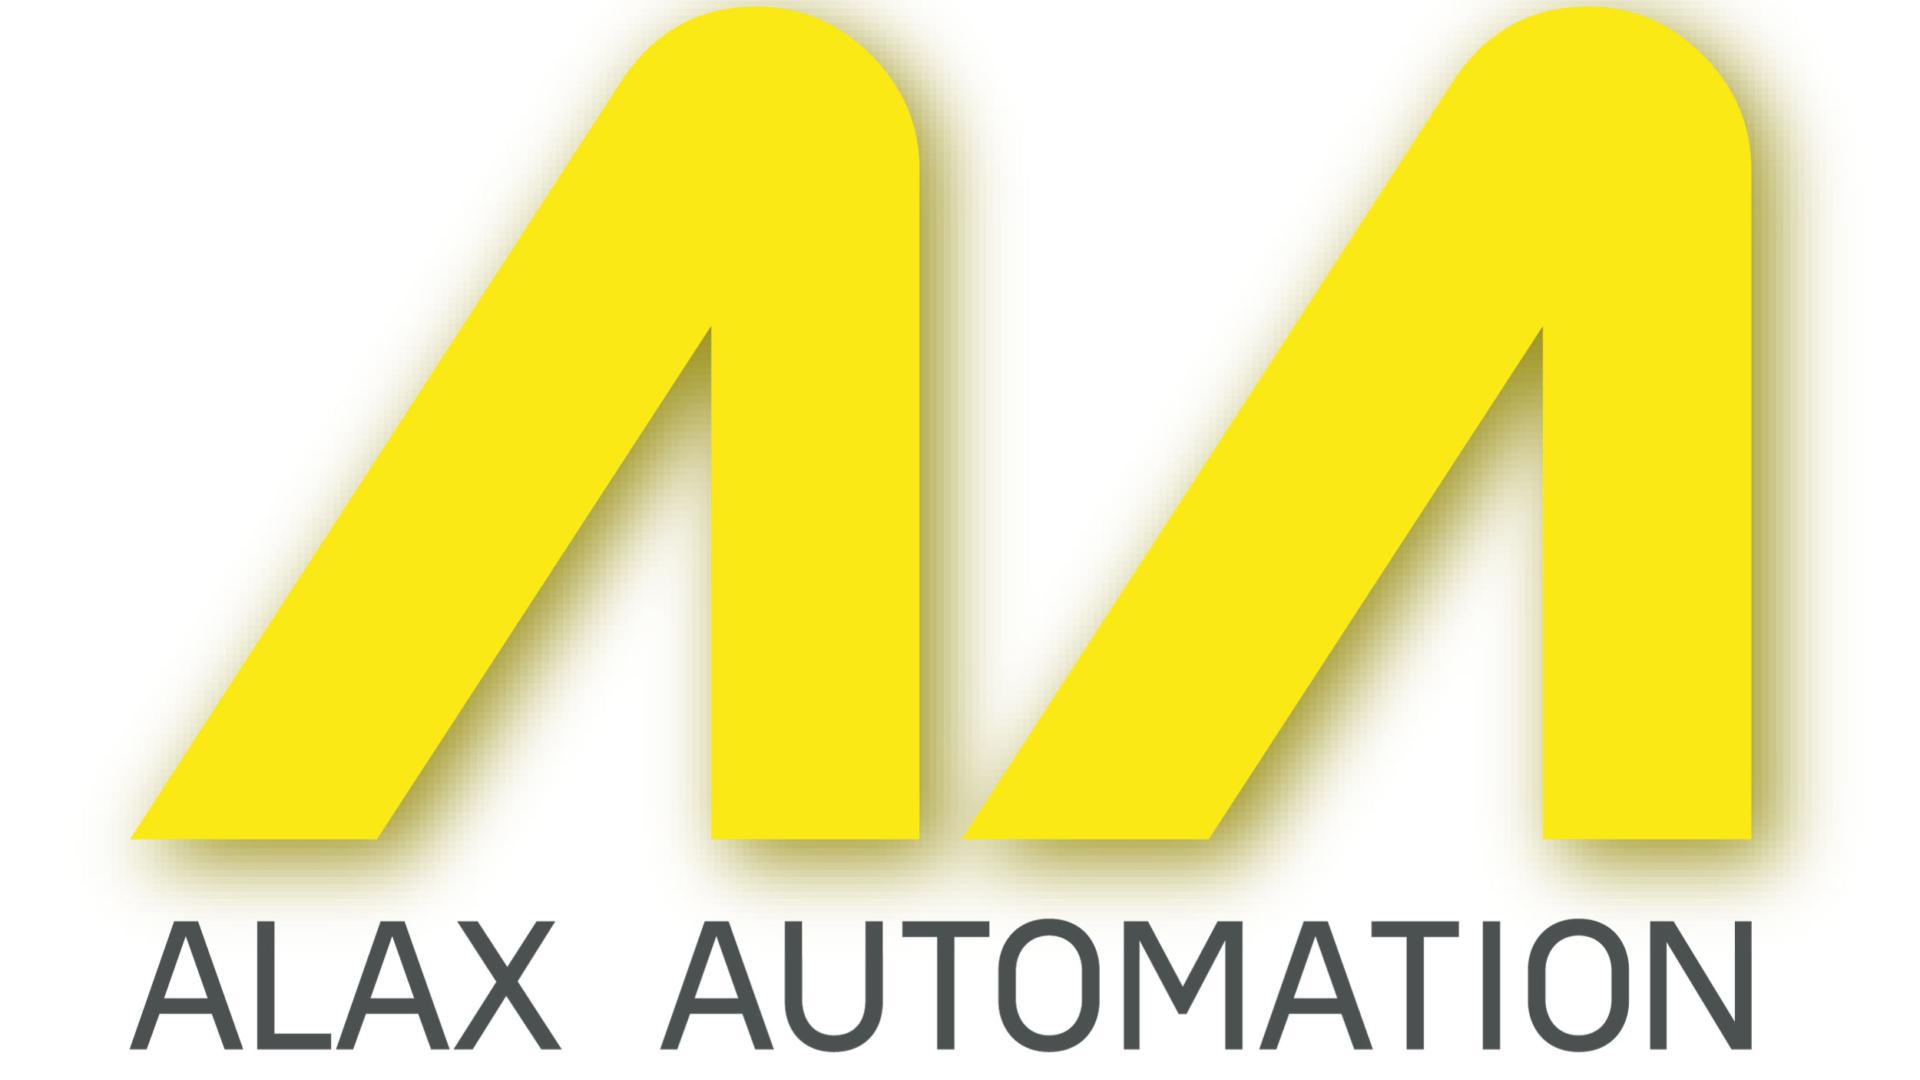 Alax Automation